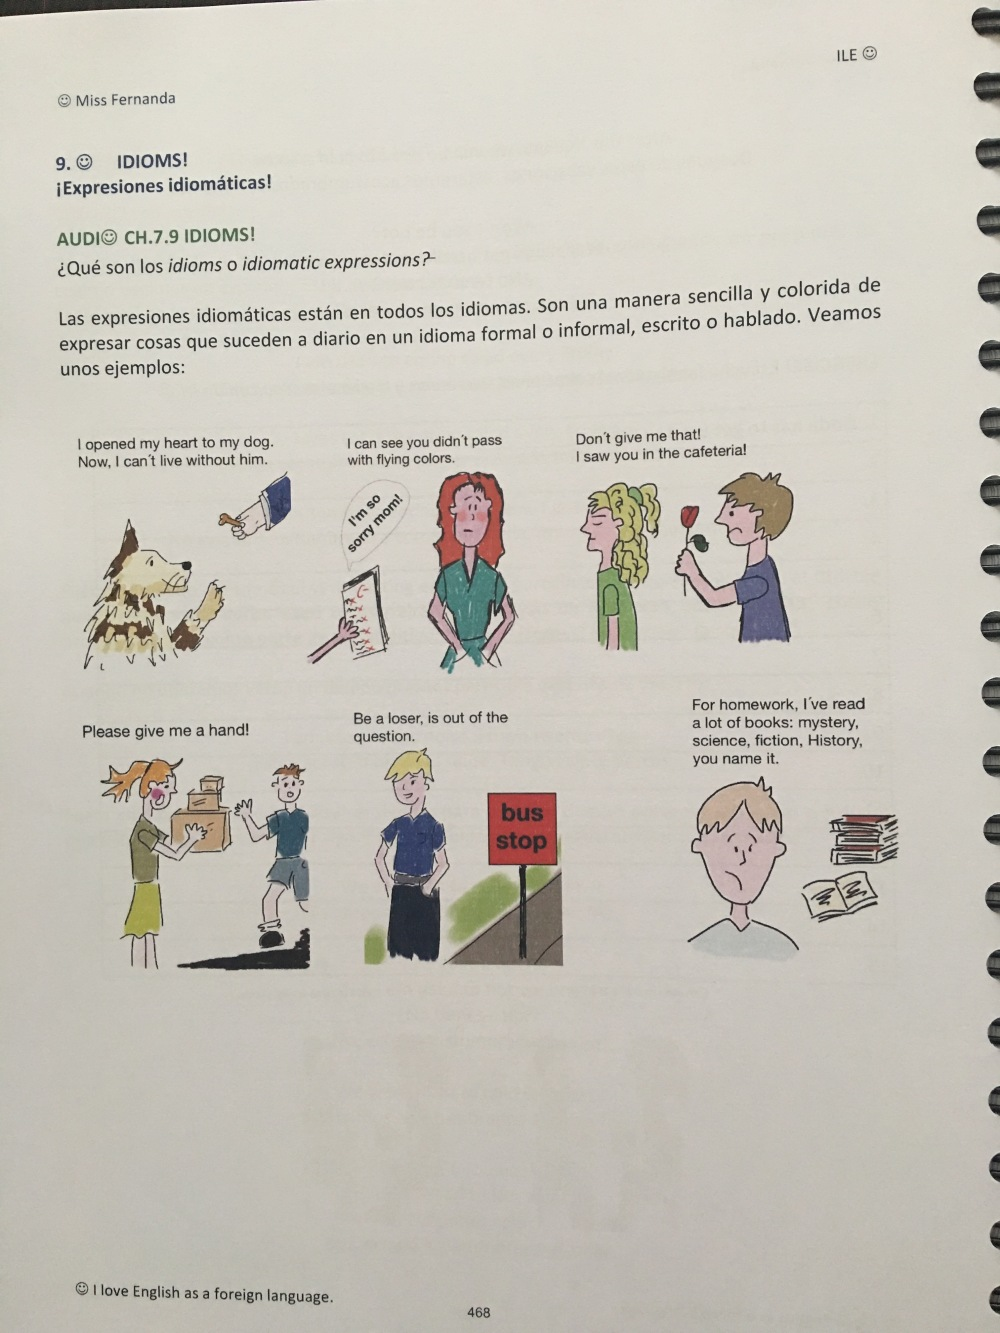 ile-book-idioms